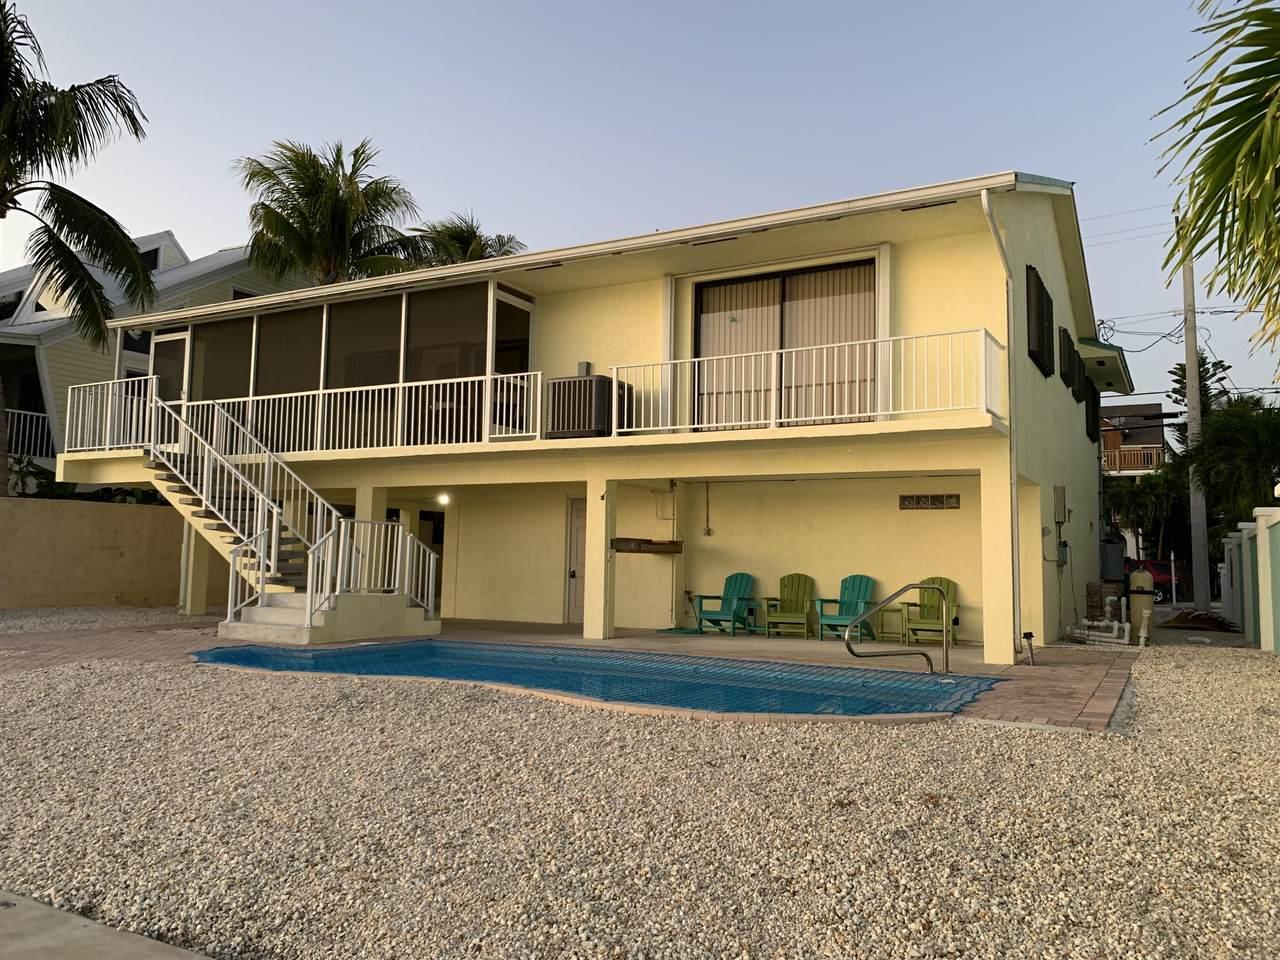 362 Caribbean Drive - Photo 1